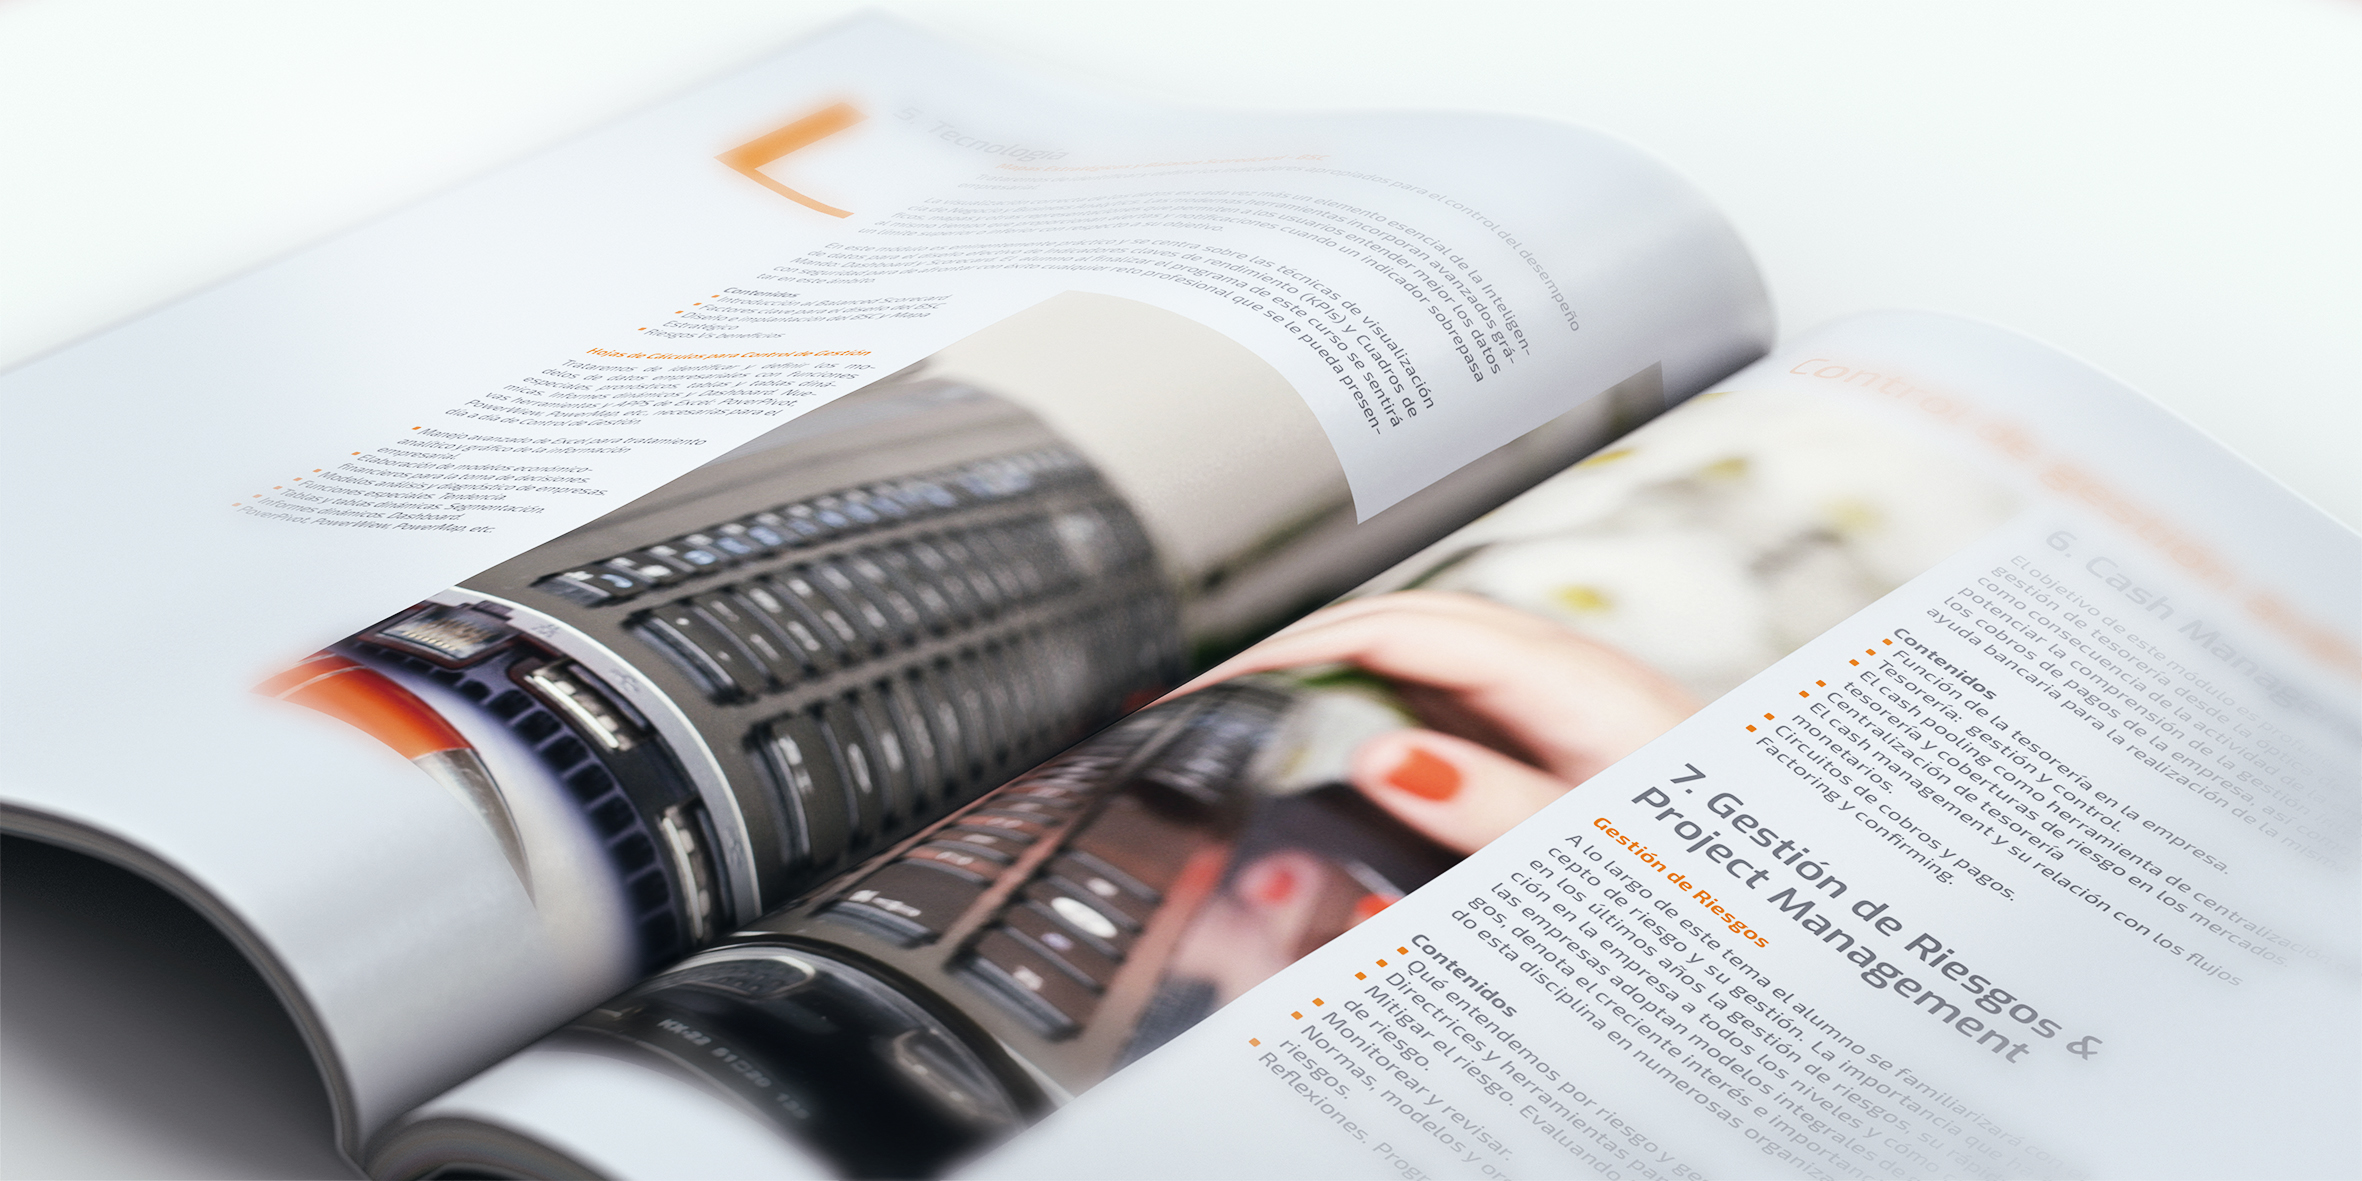 folletos cunef 4.jpg